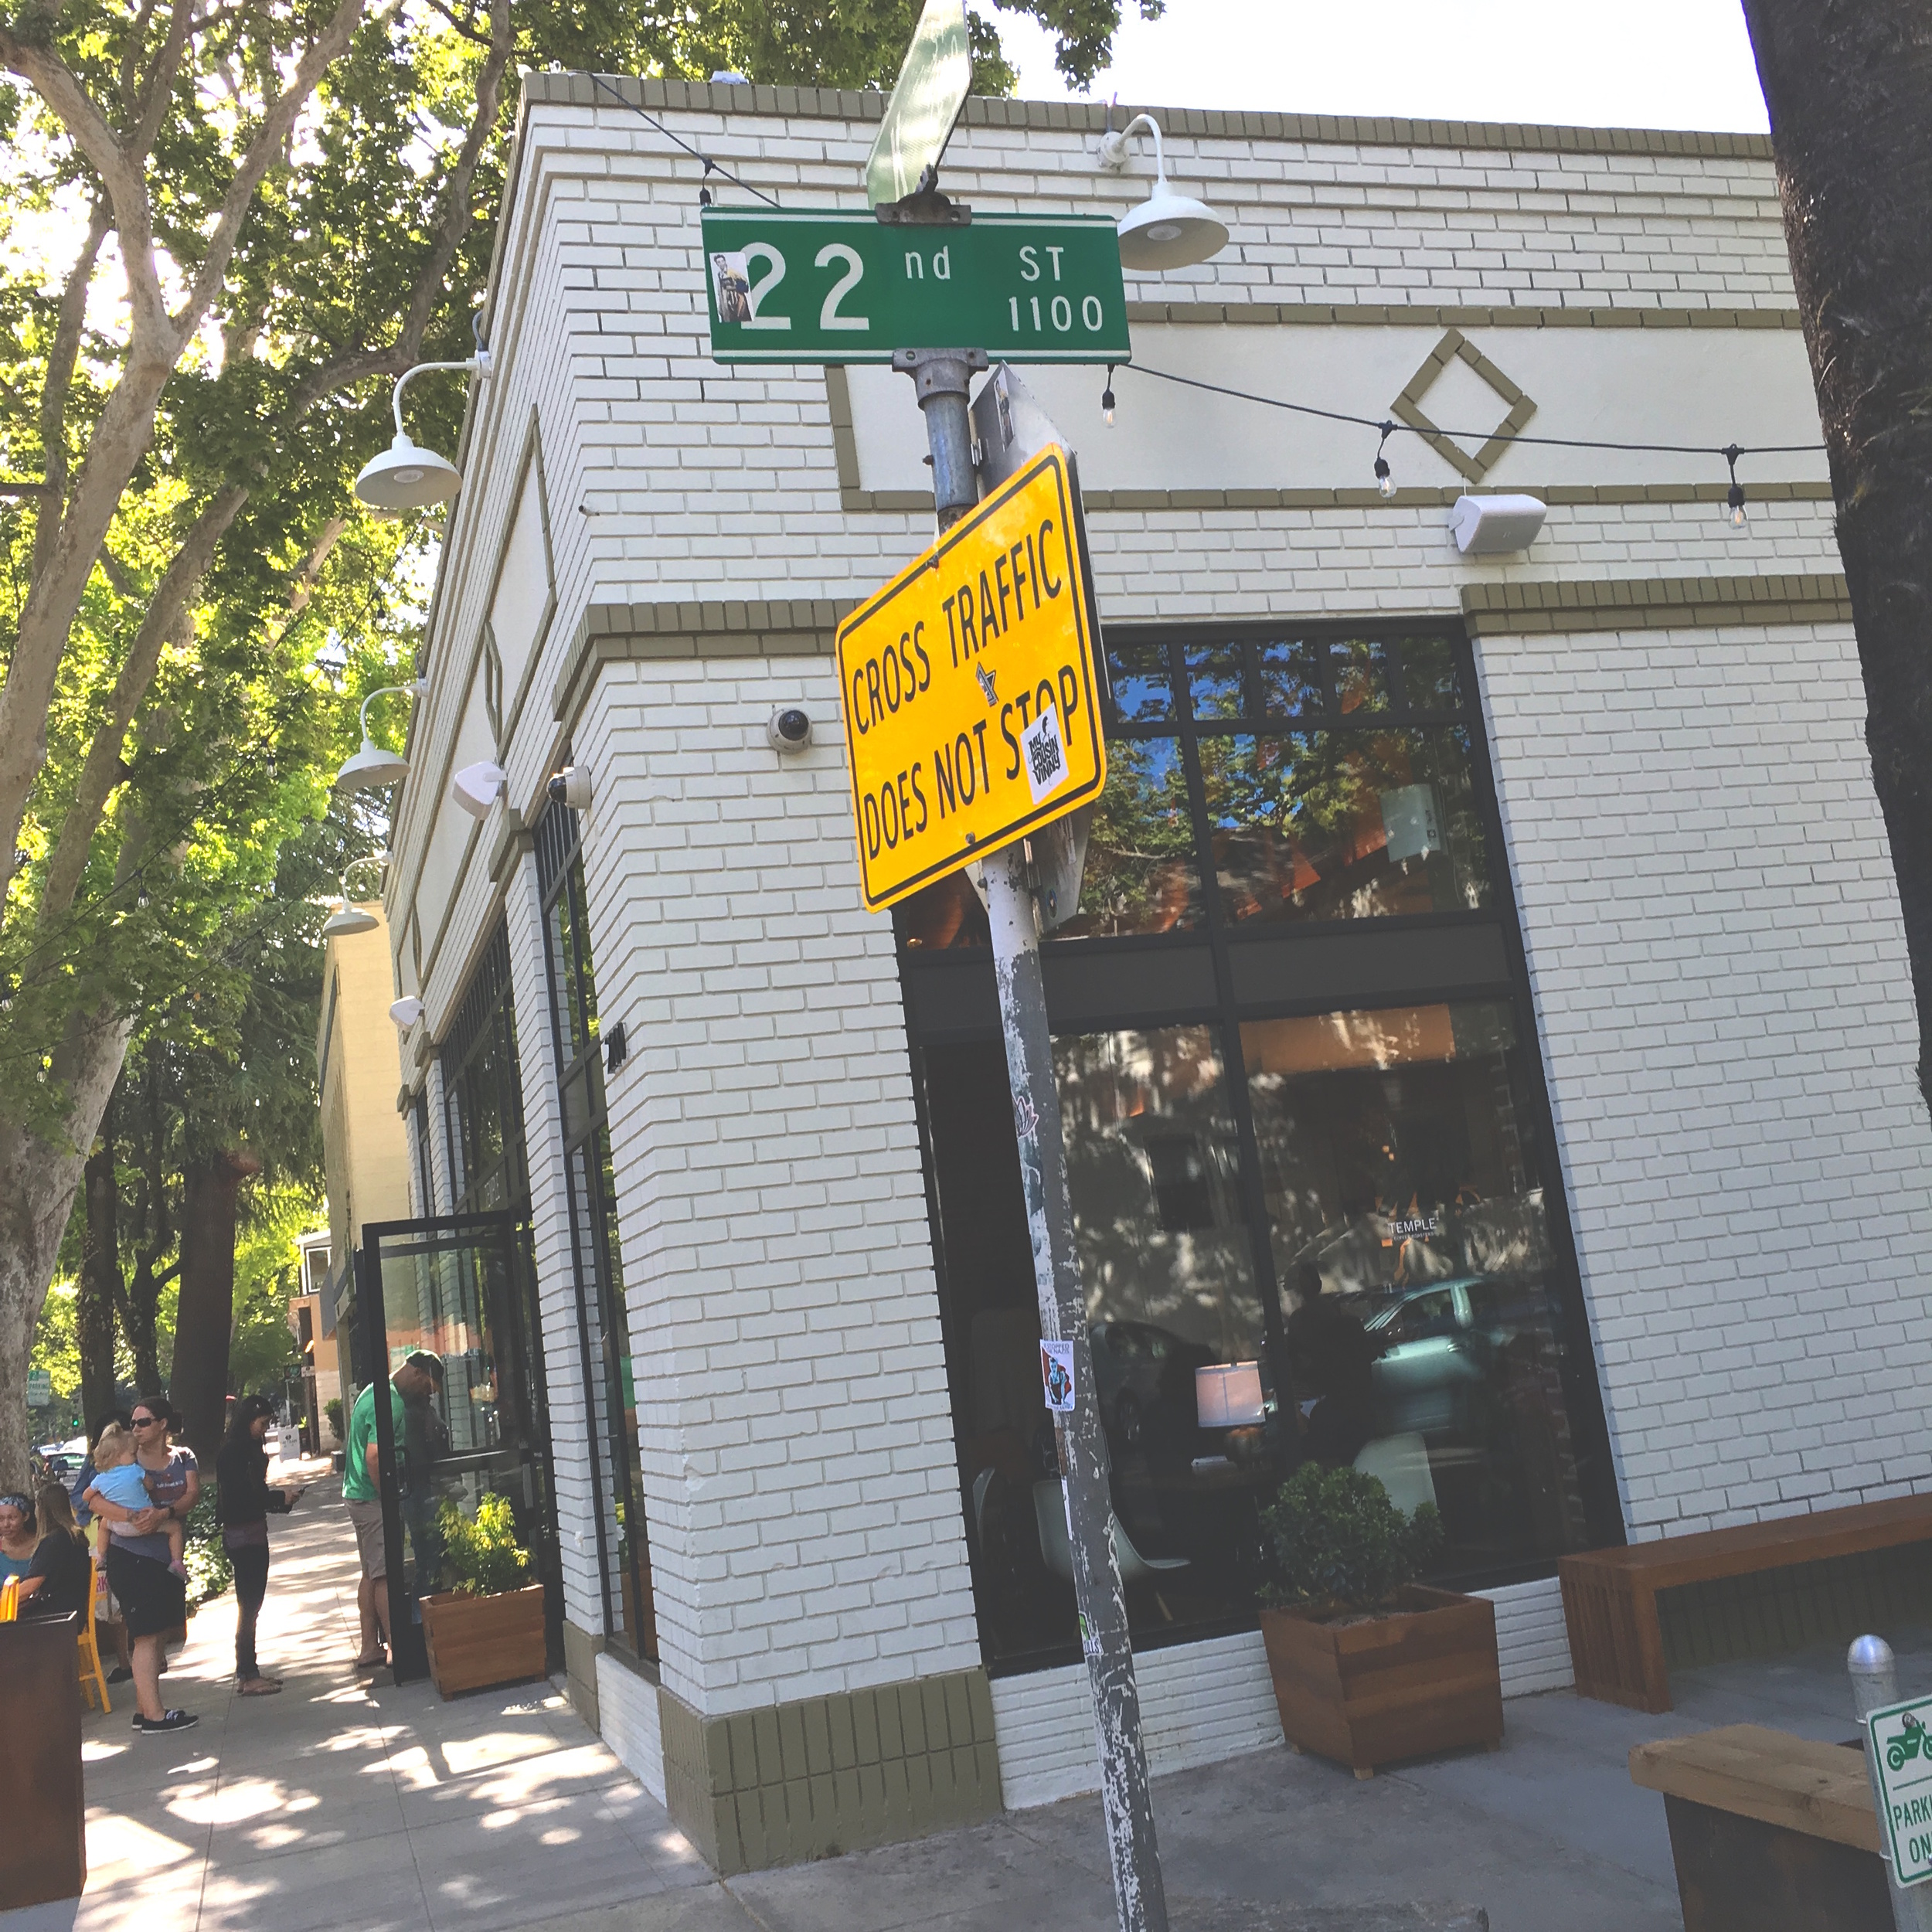 Temple Coffee on K Street & 22nd.